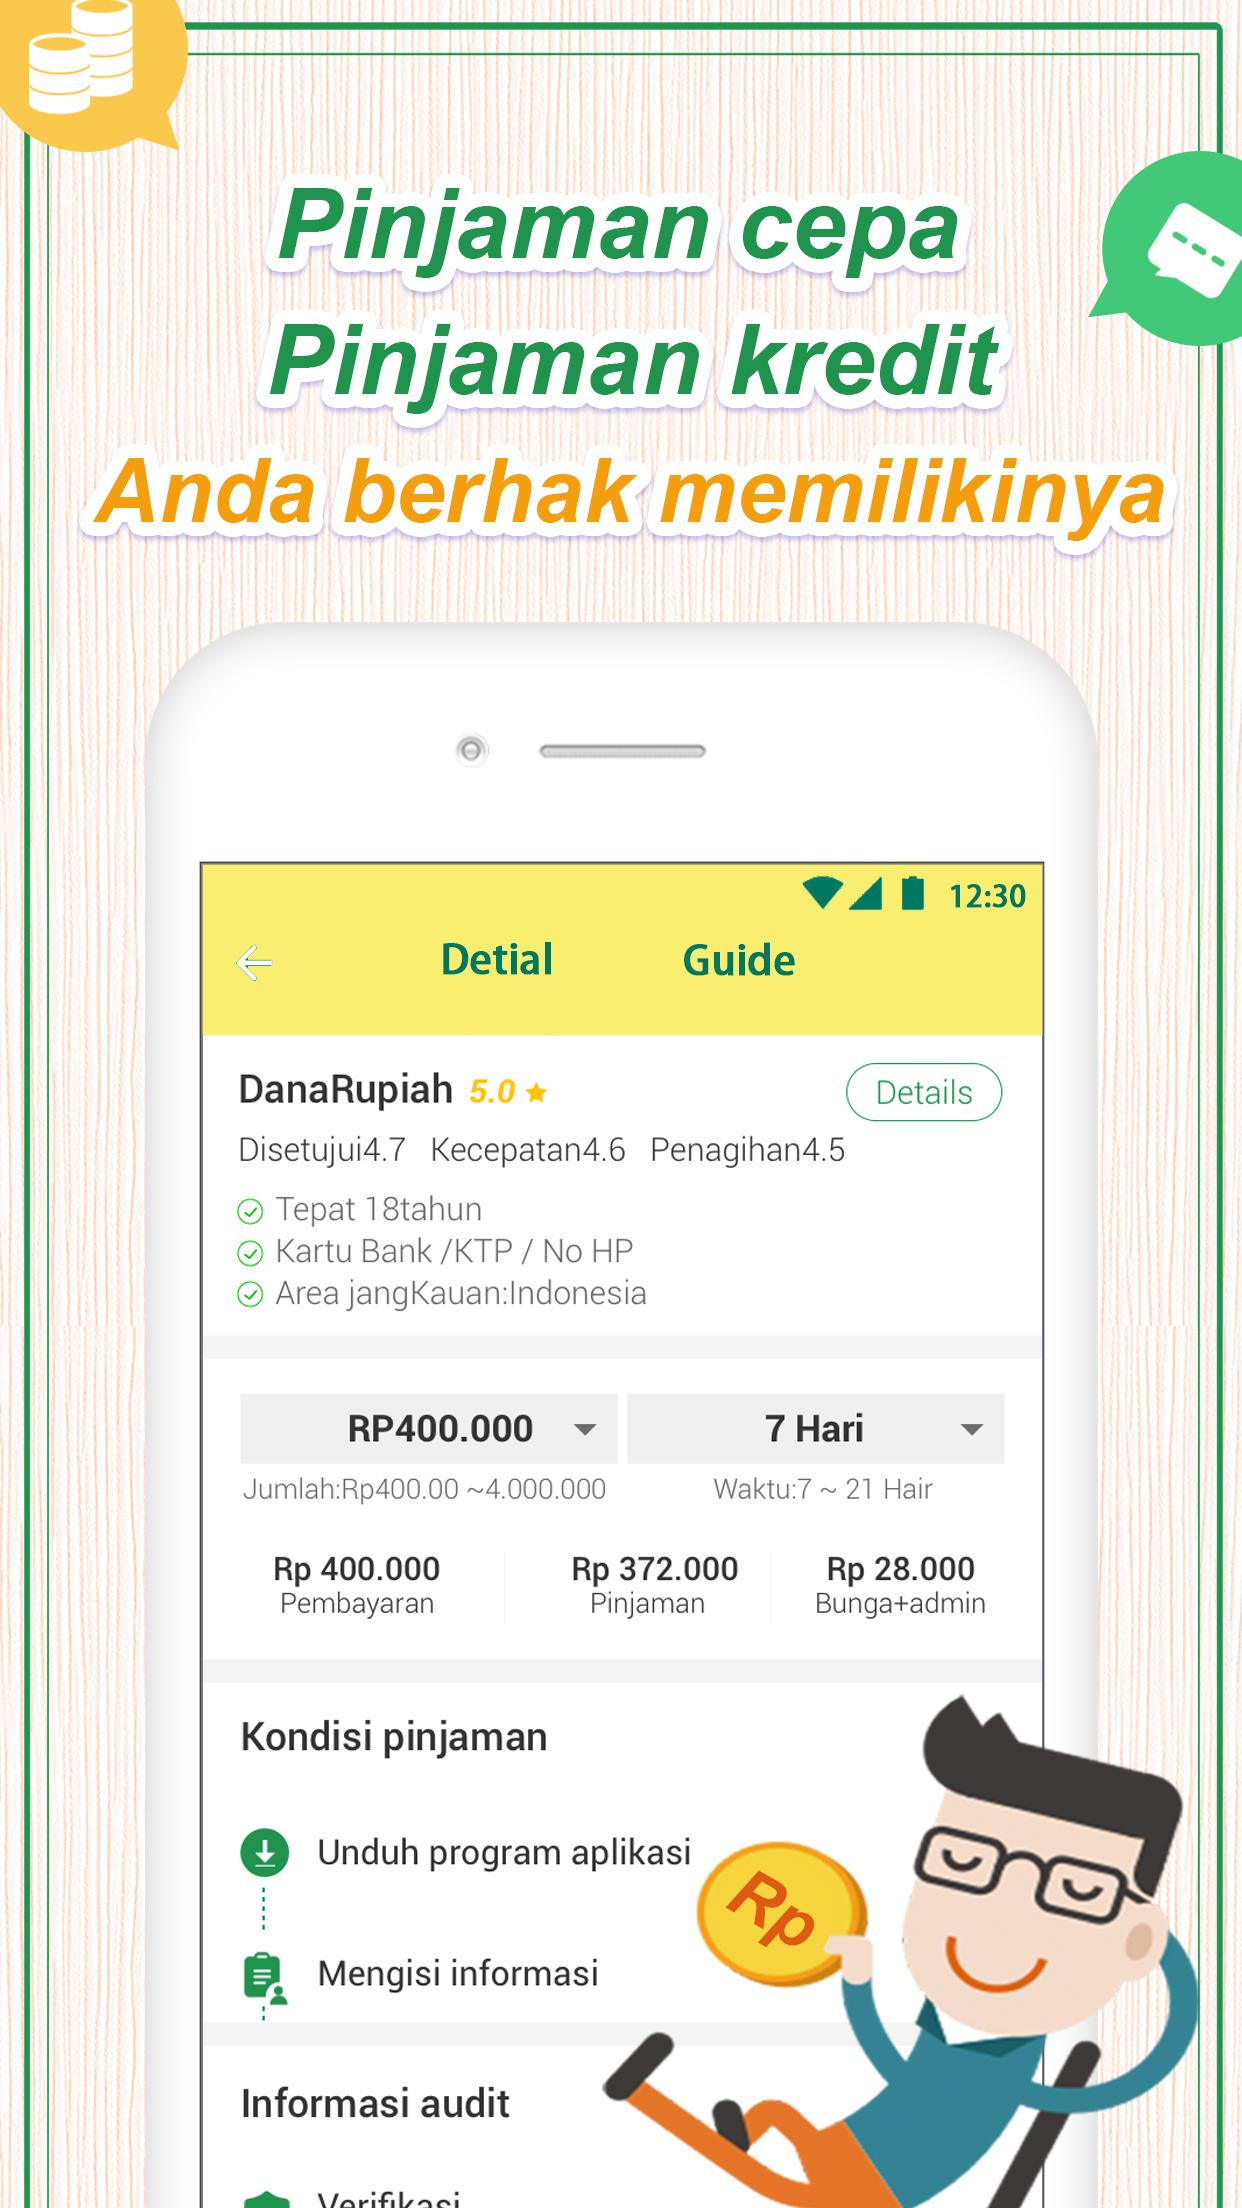 Banana Duit Uang Pinjam Cepat Online For Android Apk Download